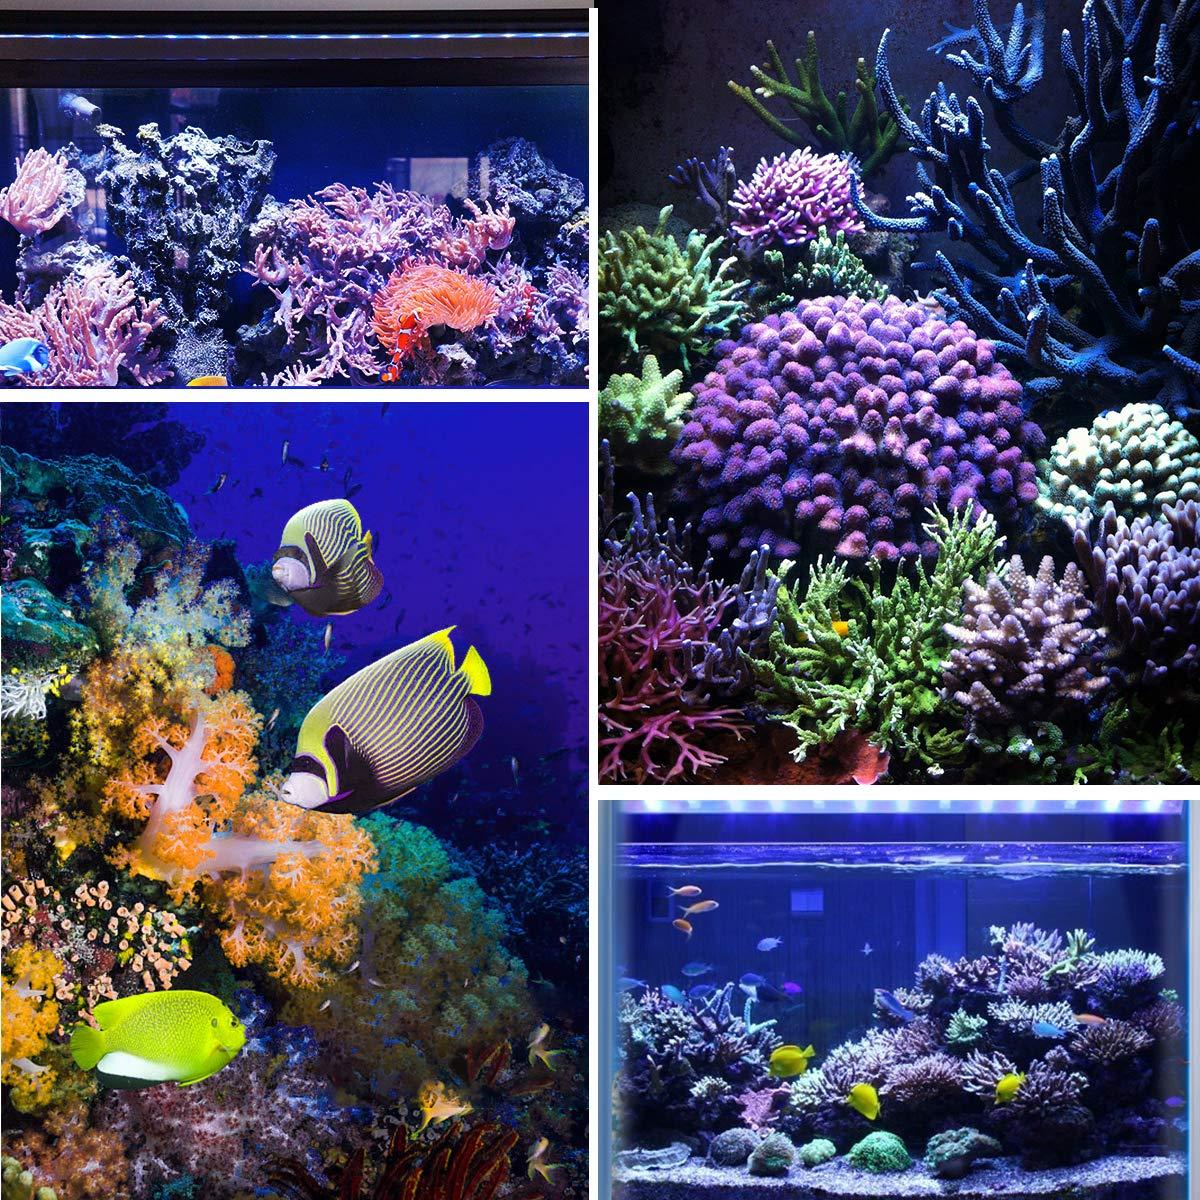 Nano Lampe Aquarium Barre Toplanet Pour Led 135w Fish Tank AR3jL54q